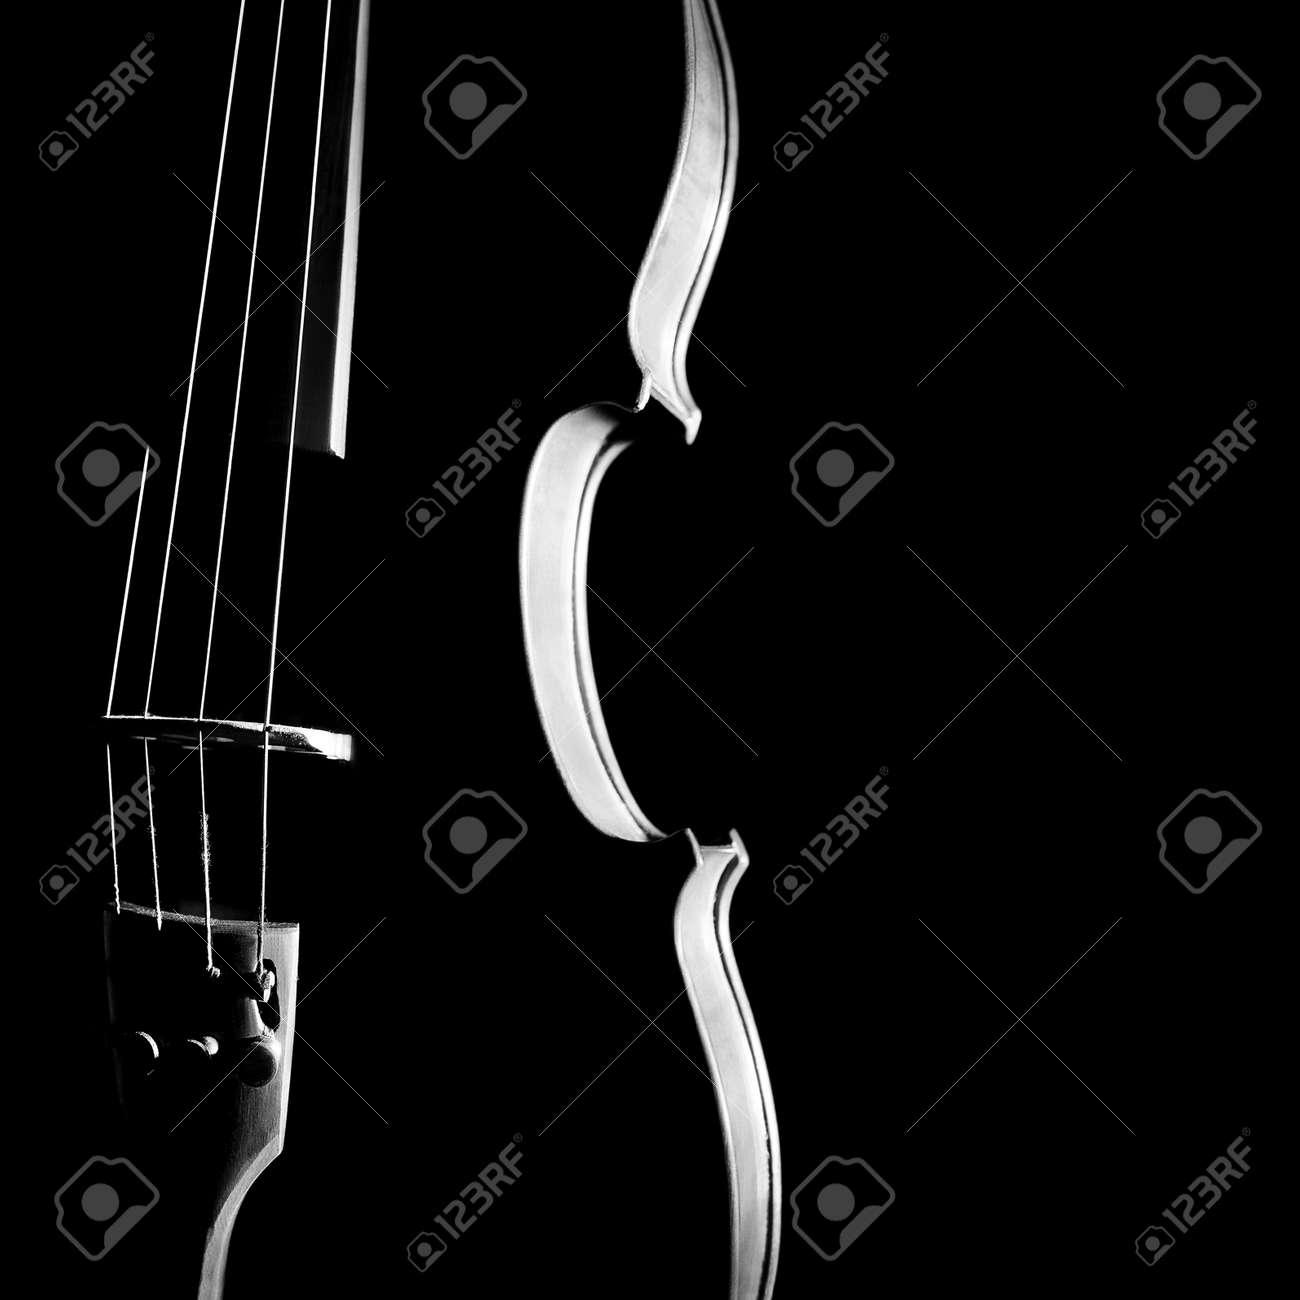 Violin orchestra musical instruments  Silhouette string closeup on black Standard-Bild - 22220709